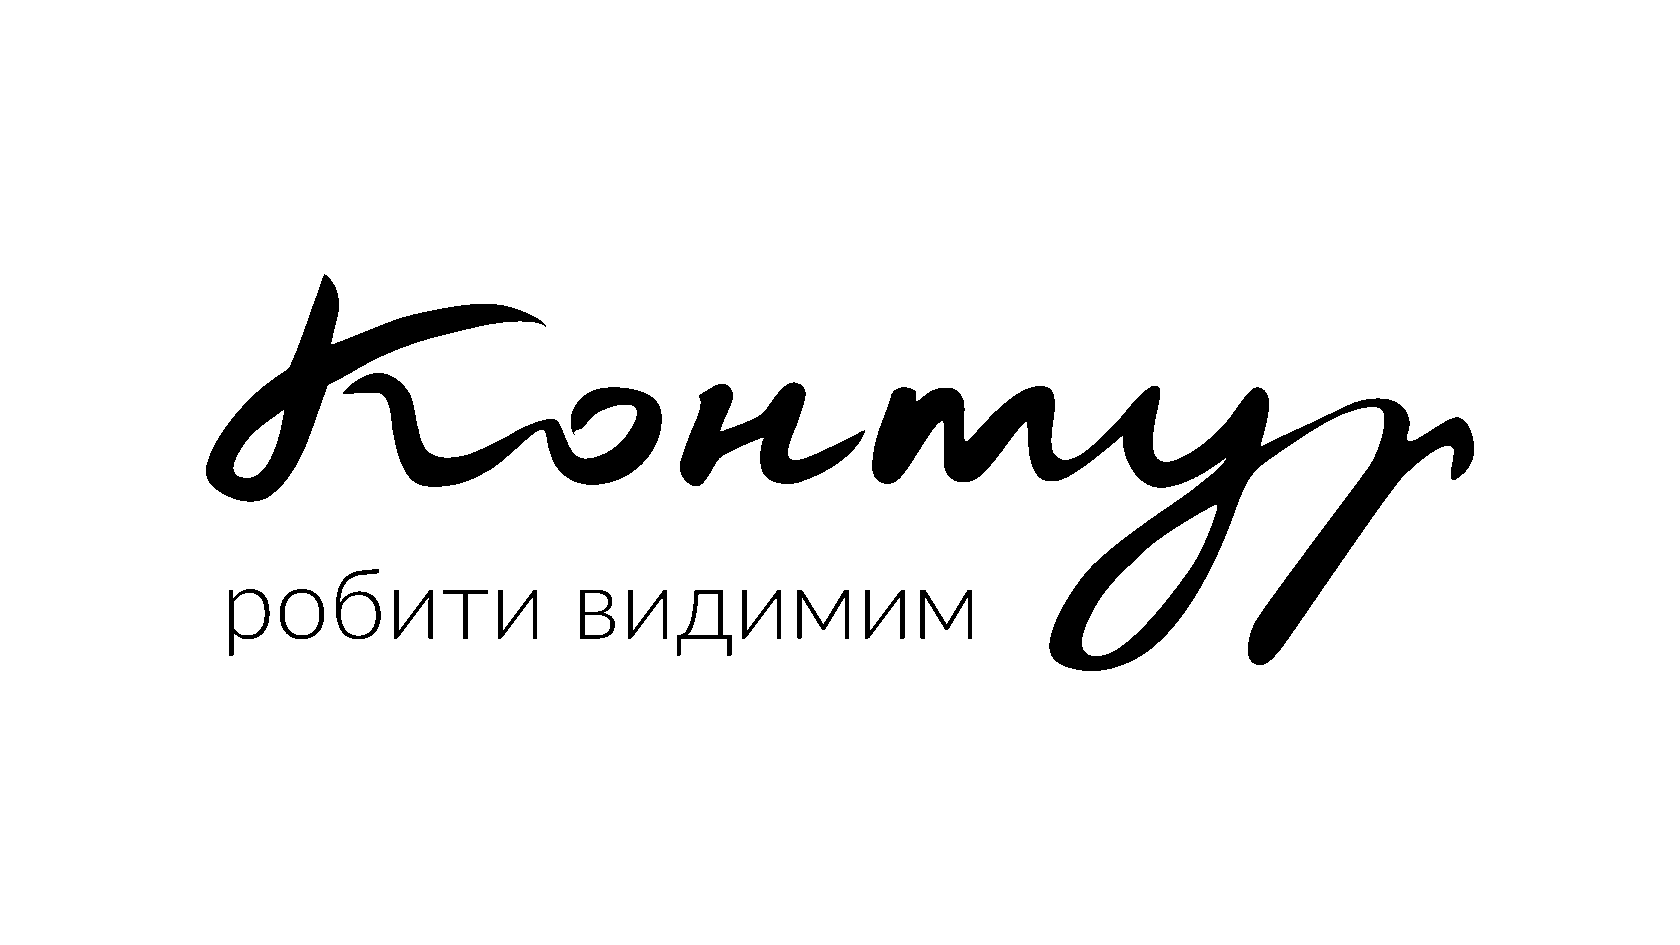 Контур